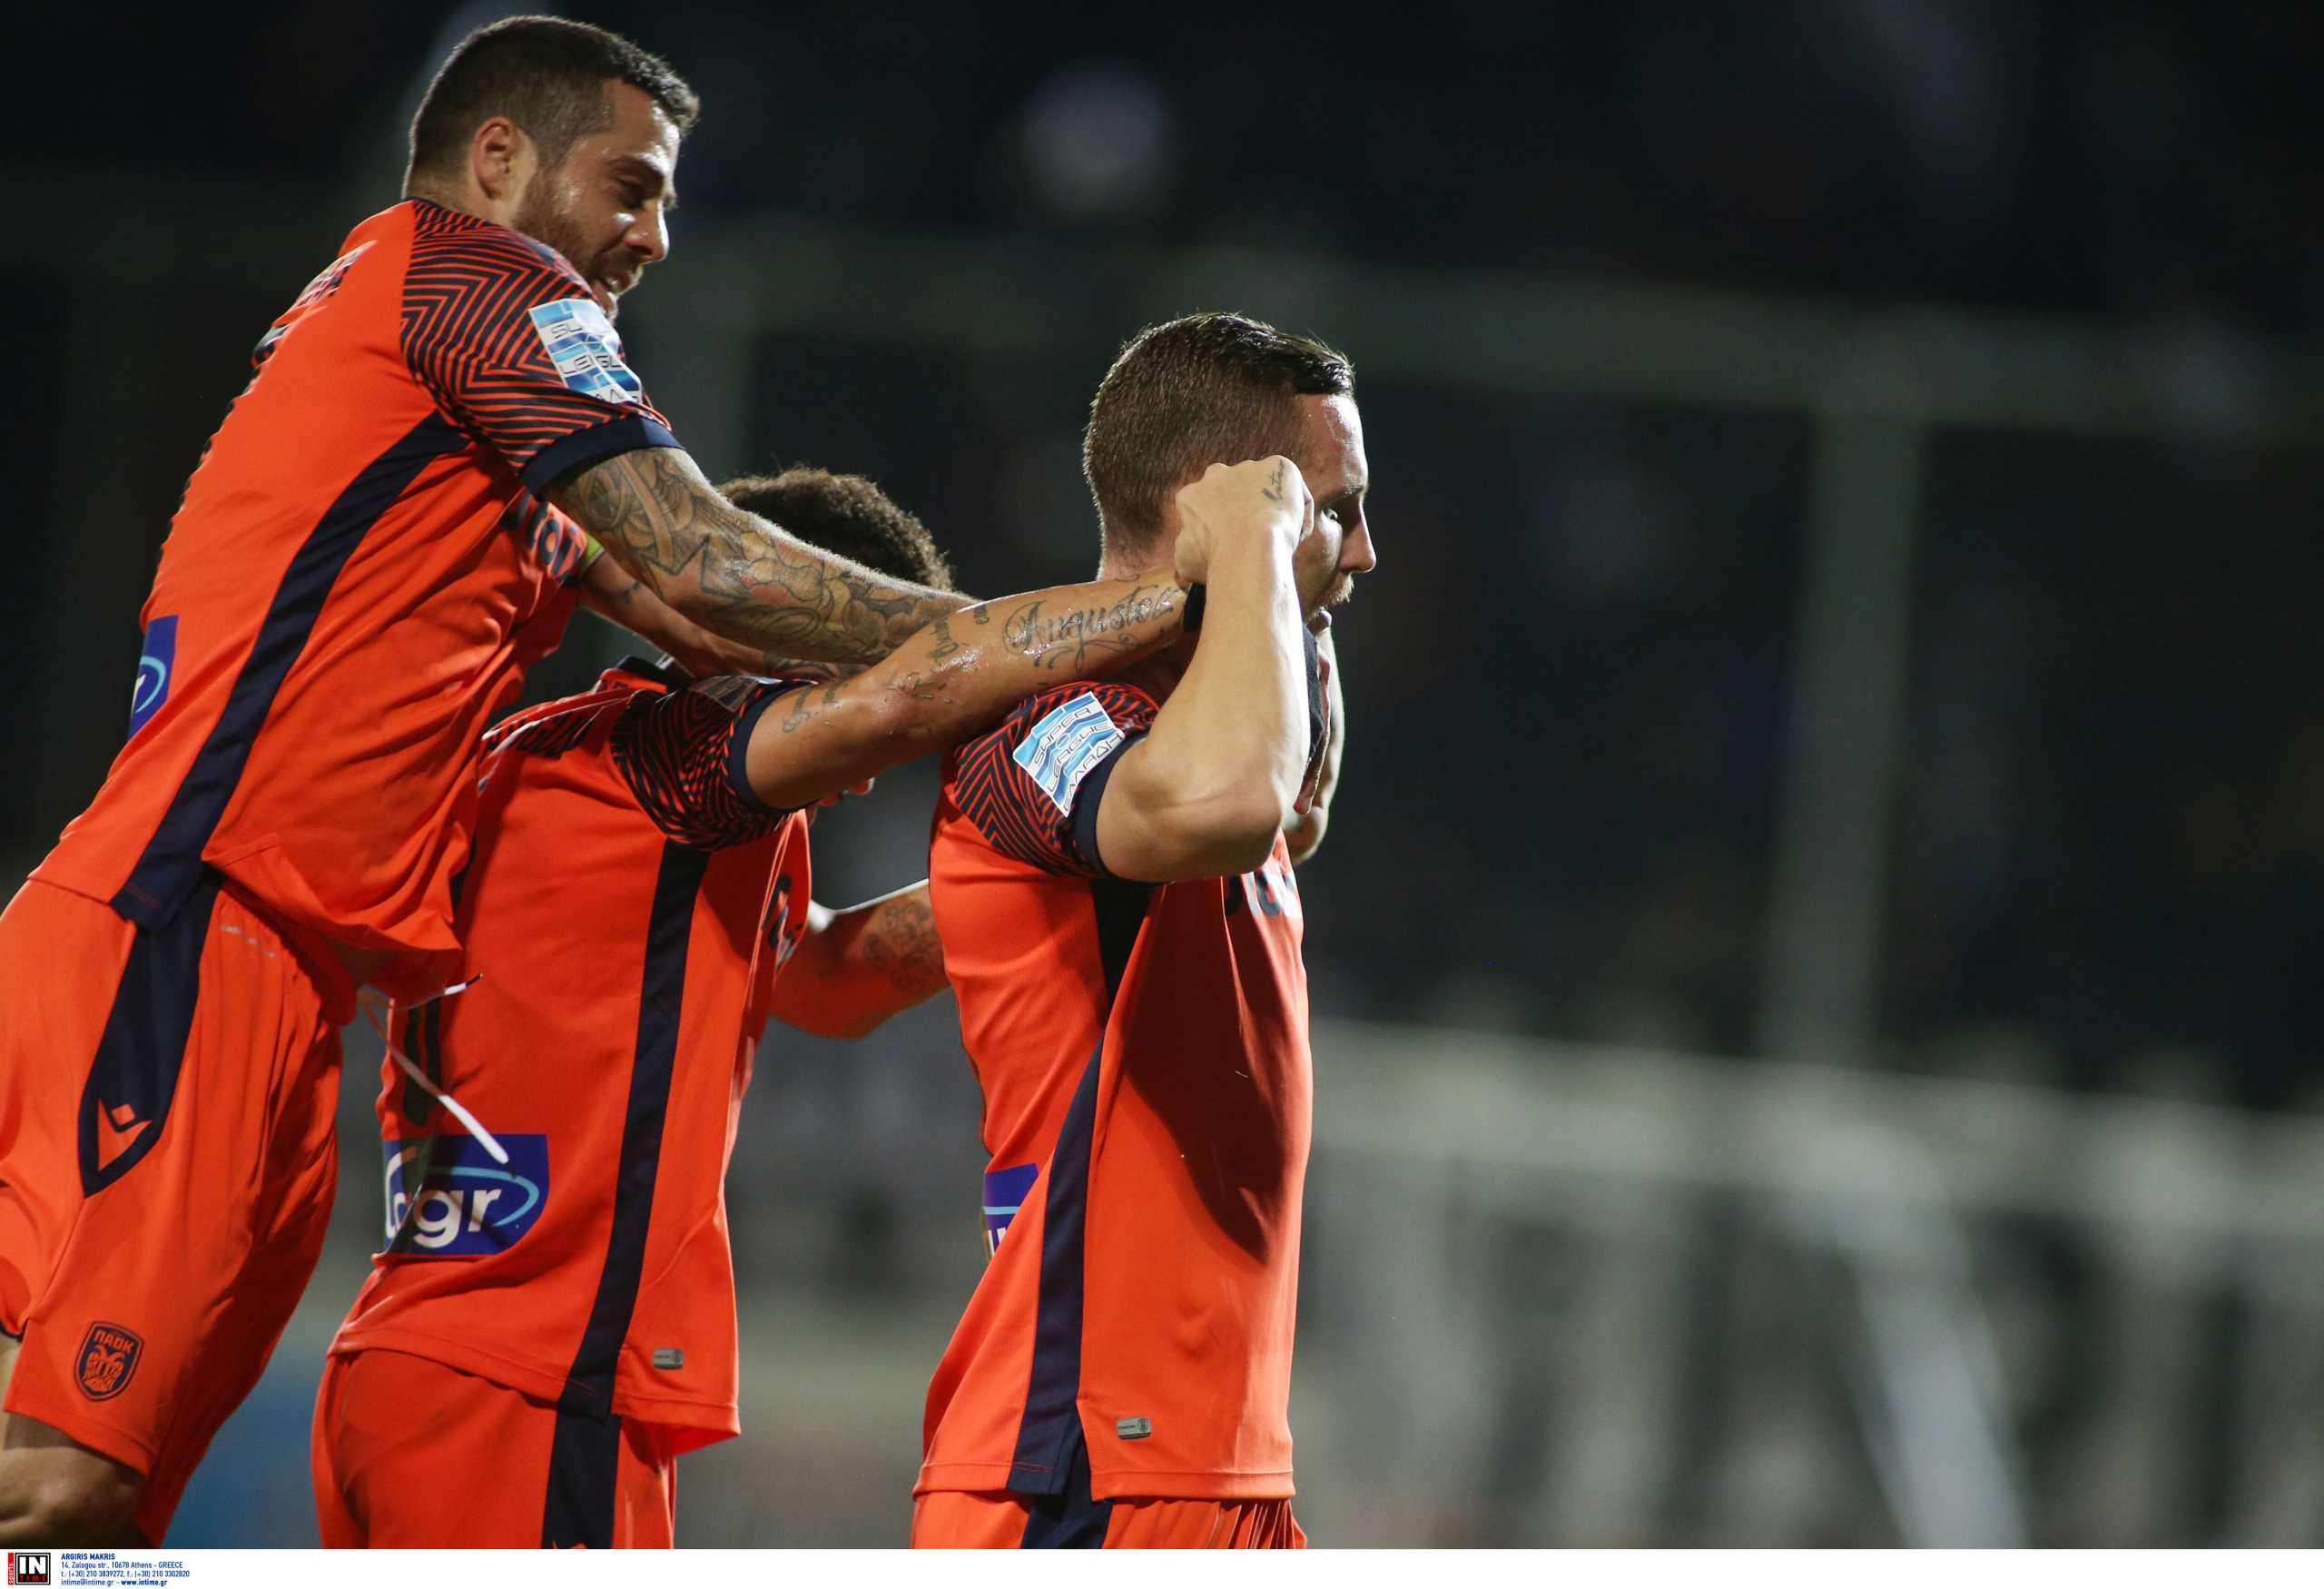 Superleague 1, ΟΦΗ – ΠΑΟΚ 1-3: Άνετο πέρασμα από το Ηράκλειο